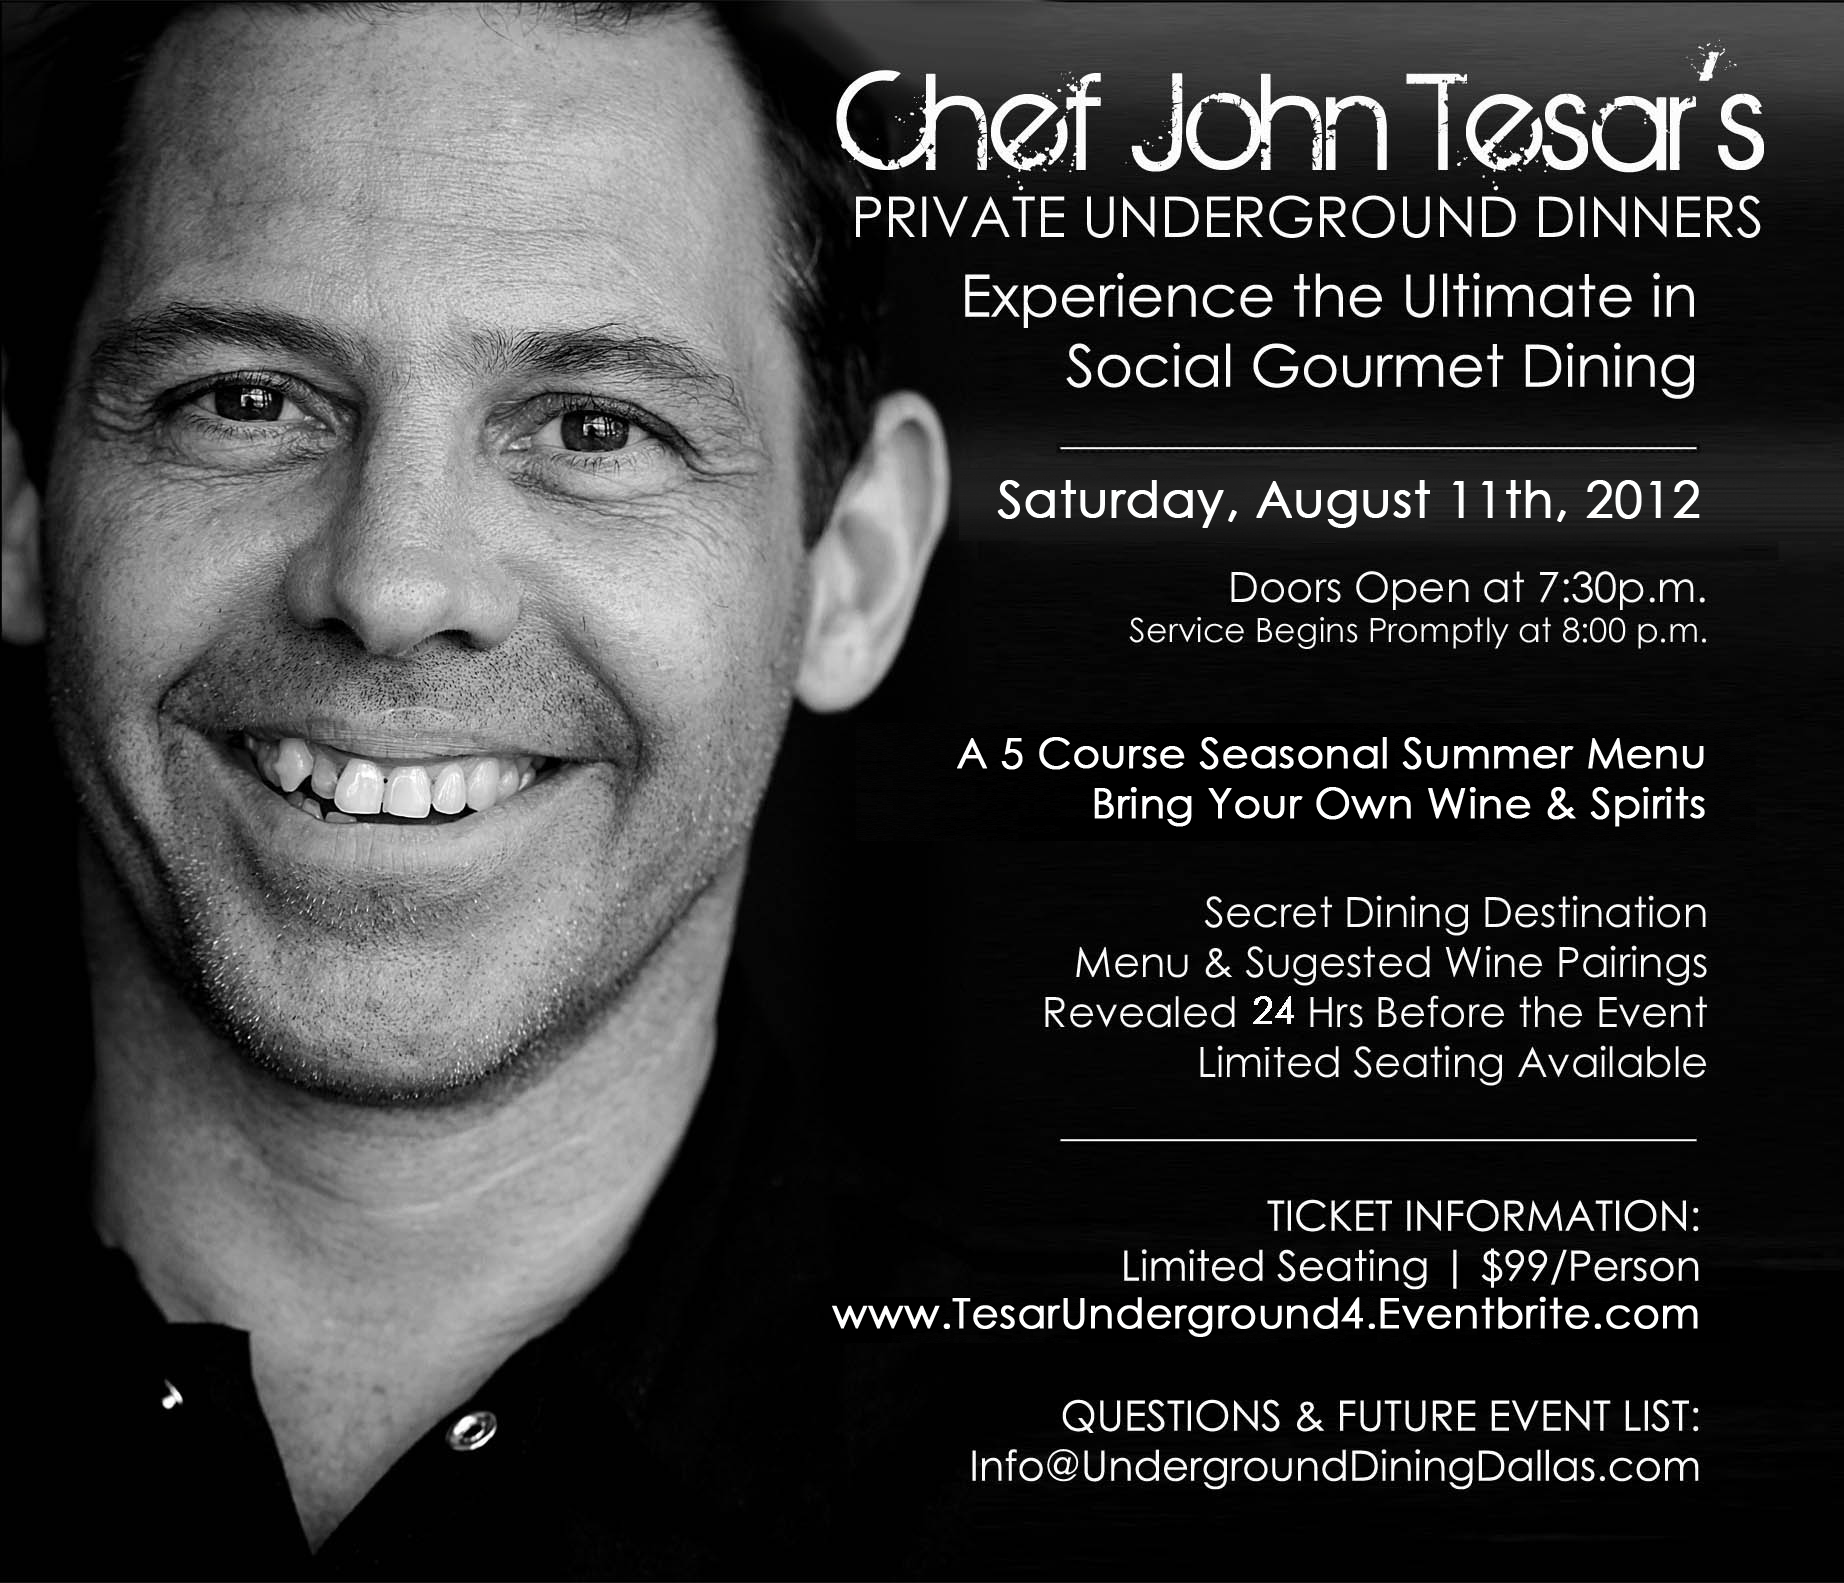 Chef John Tesar's Private Underground Dinner